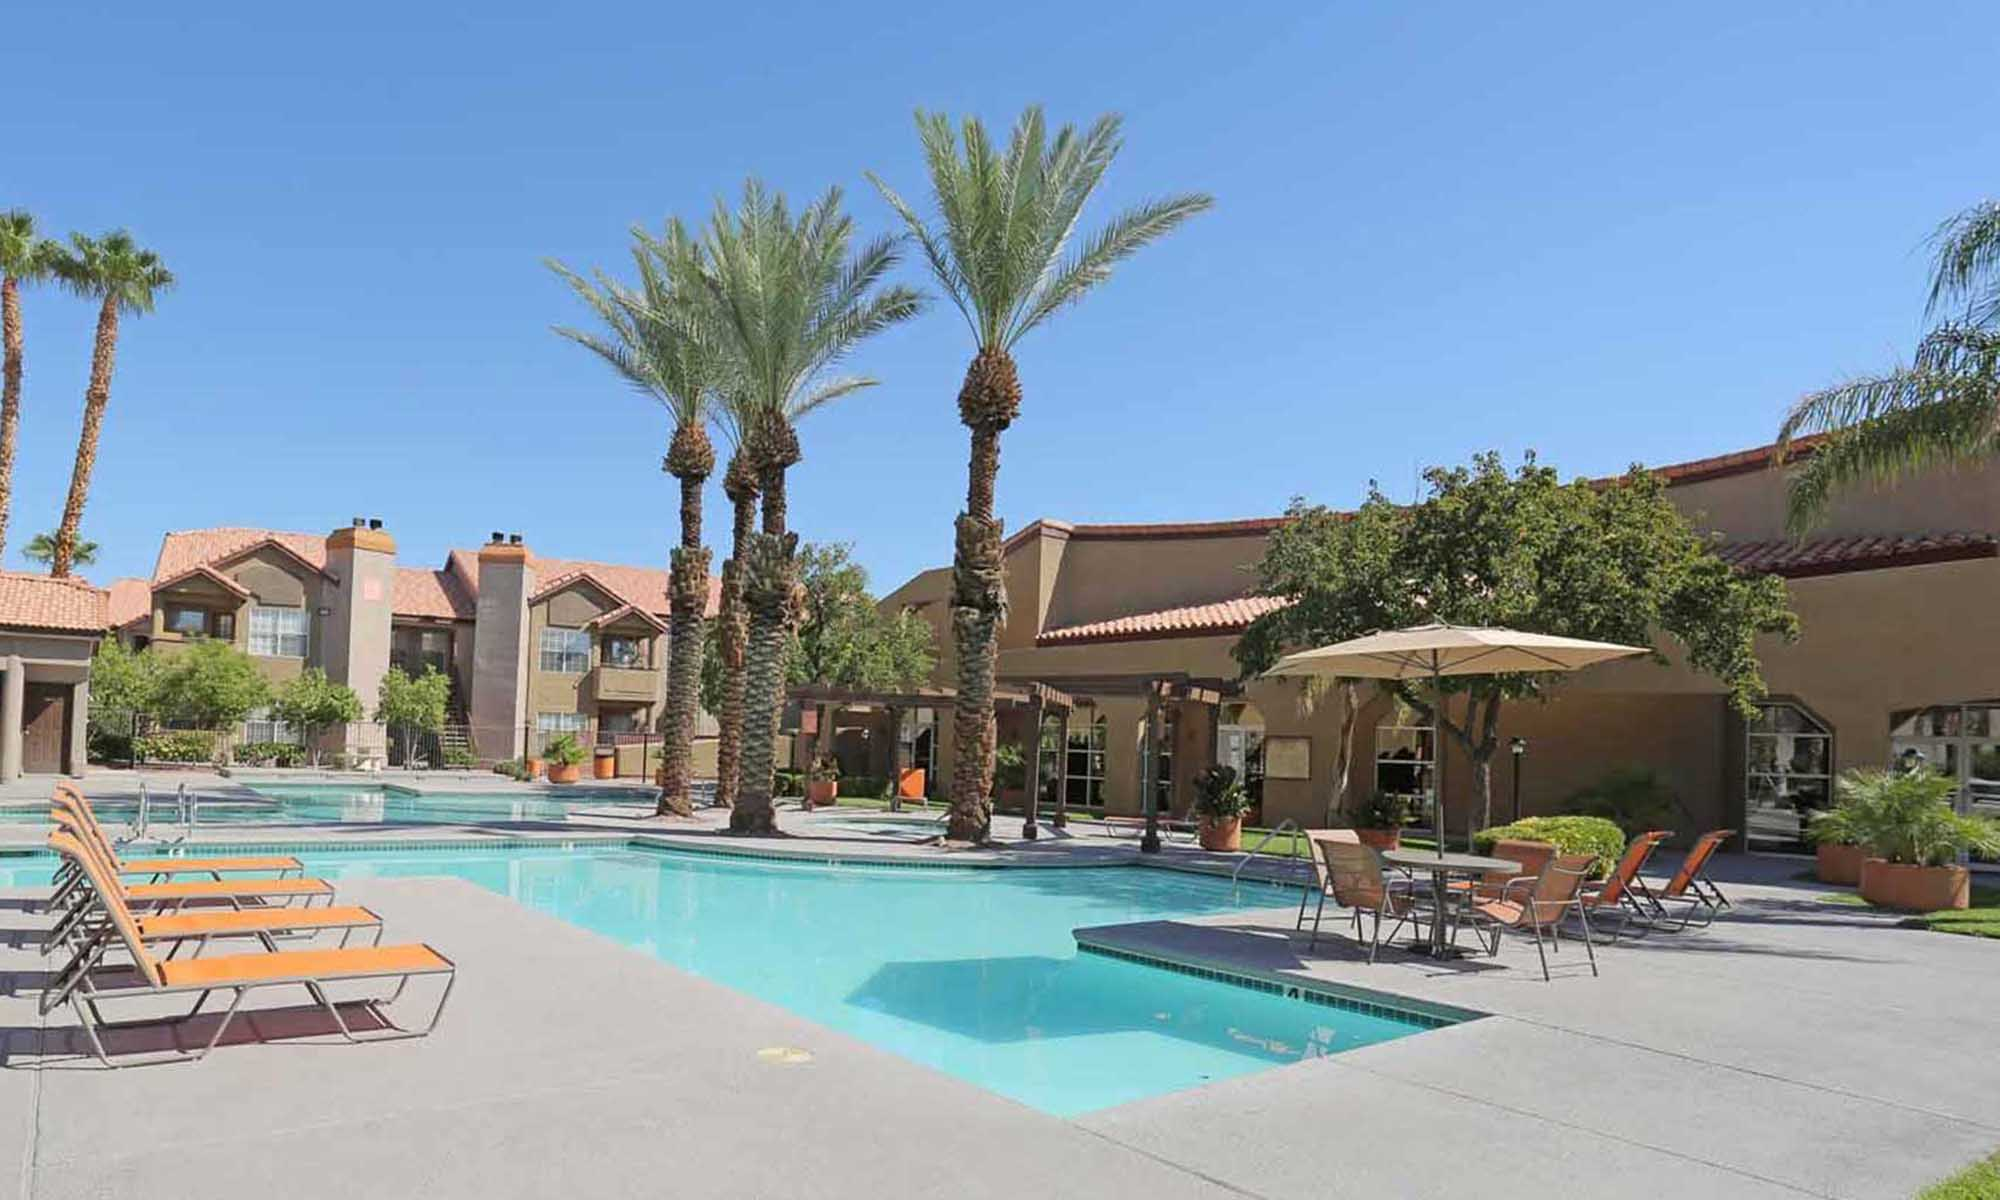 View of the Entrata Di Paradiso swimming pool area in Las Vegas